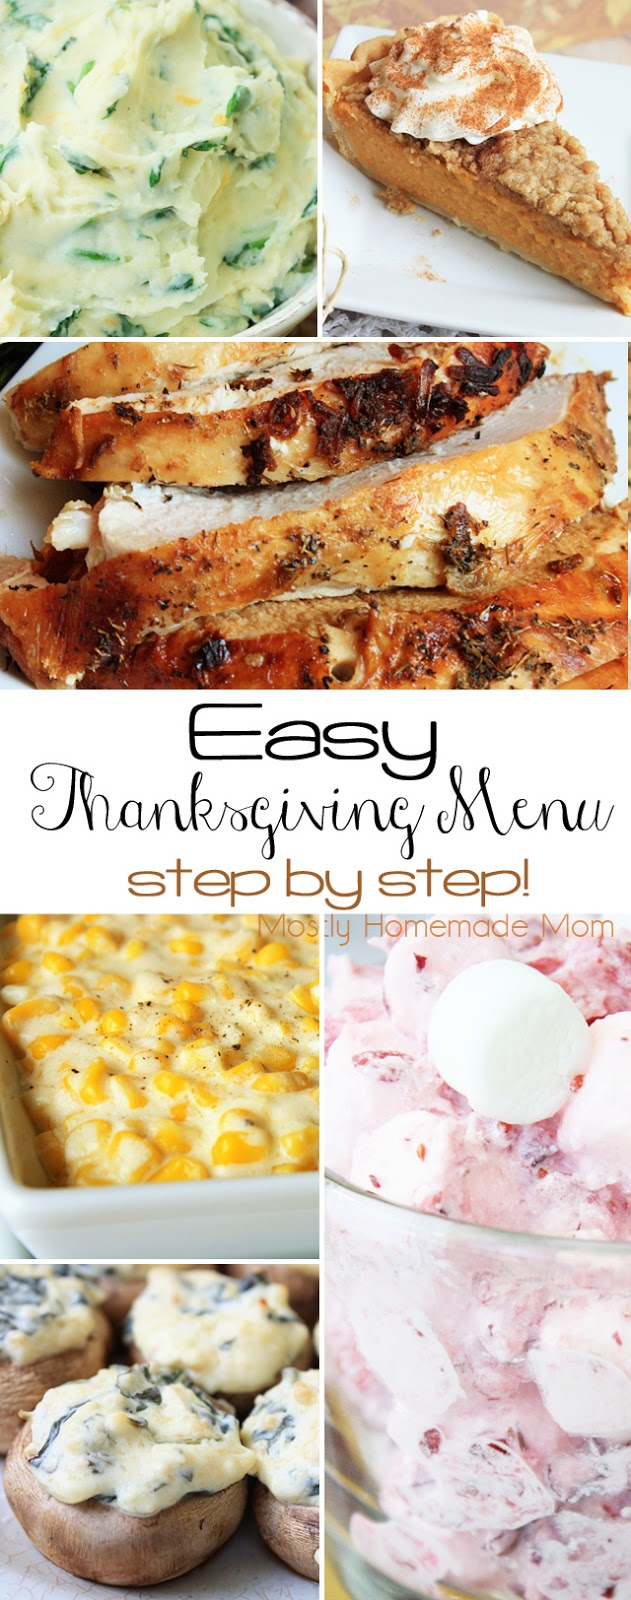 thanksgiving dinner menu ideas